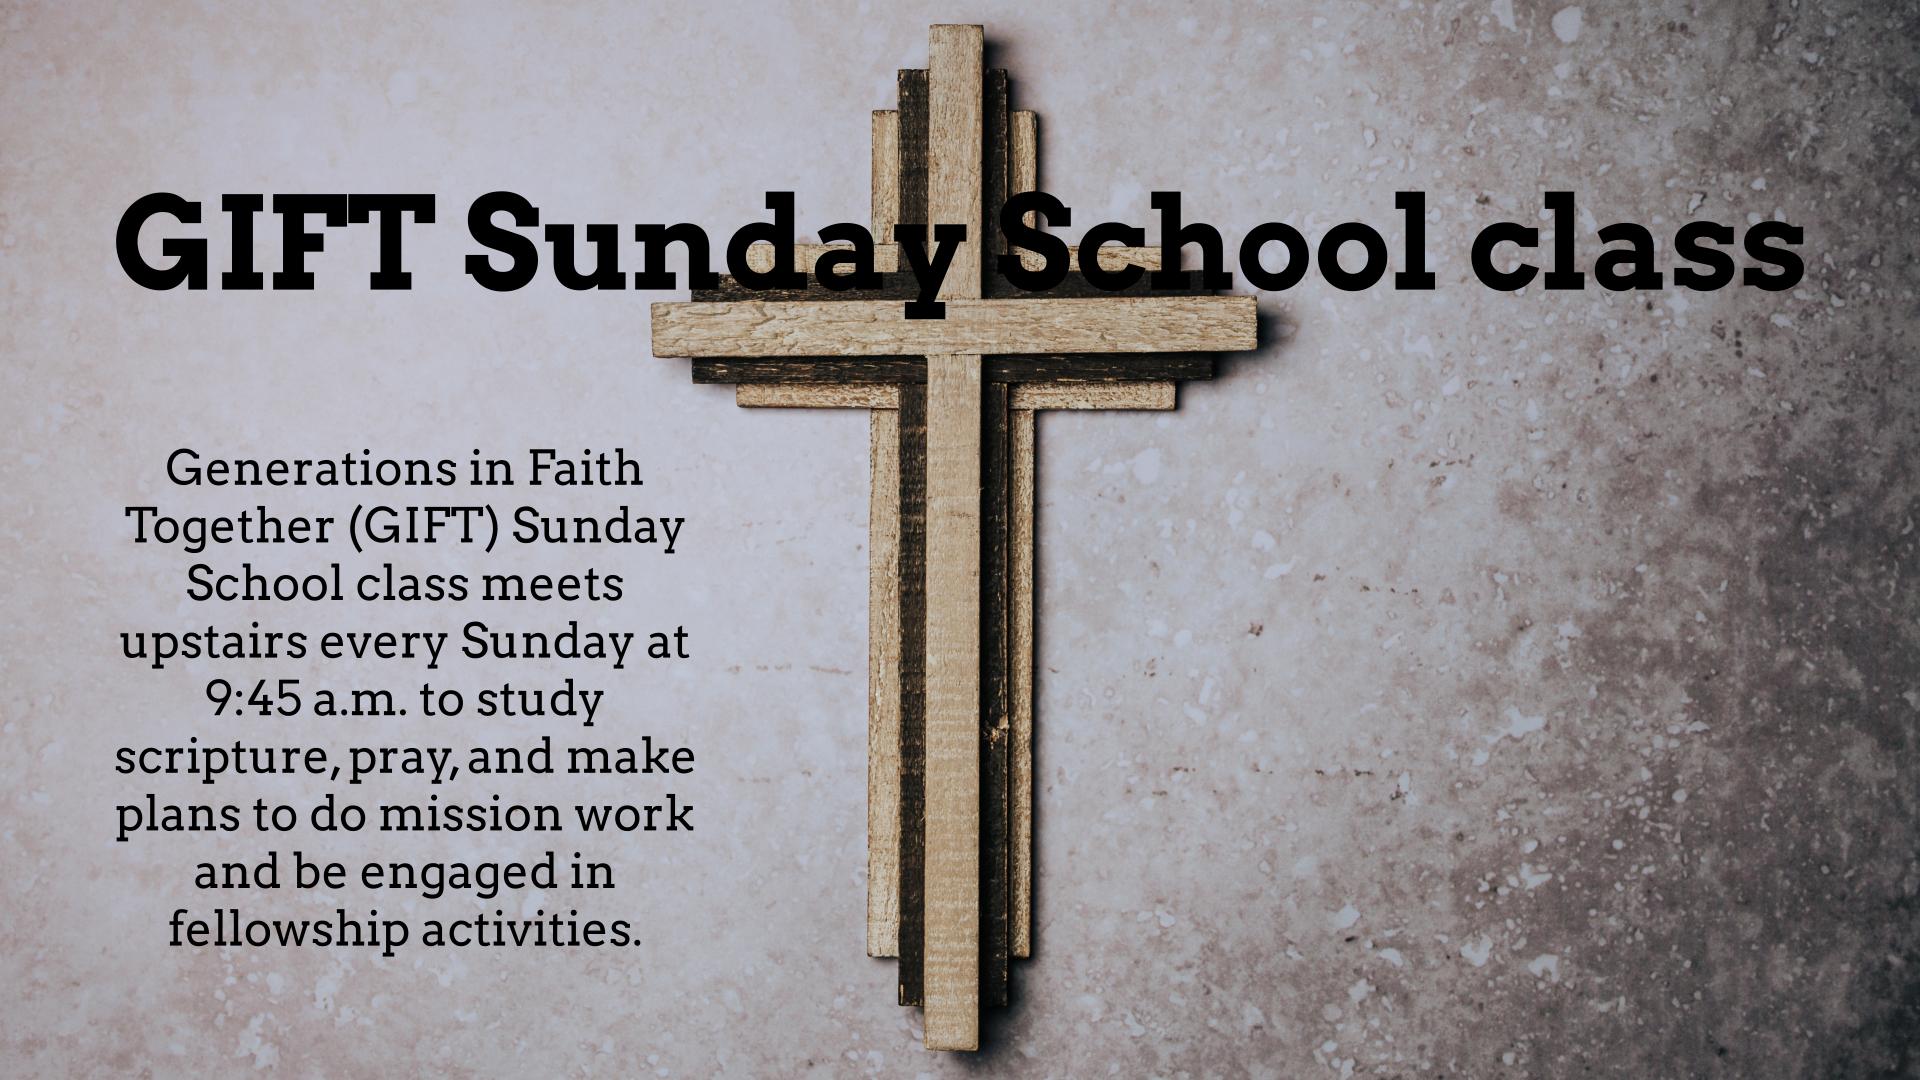 GIFT Sunday School class